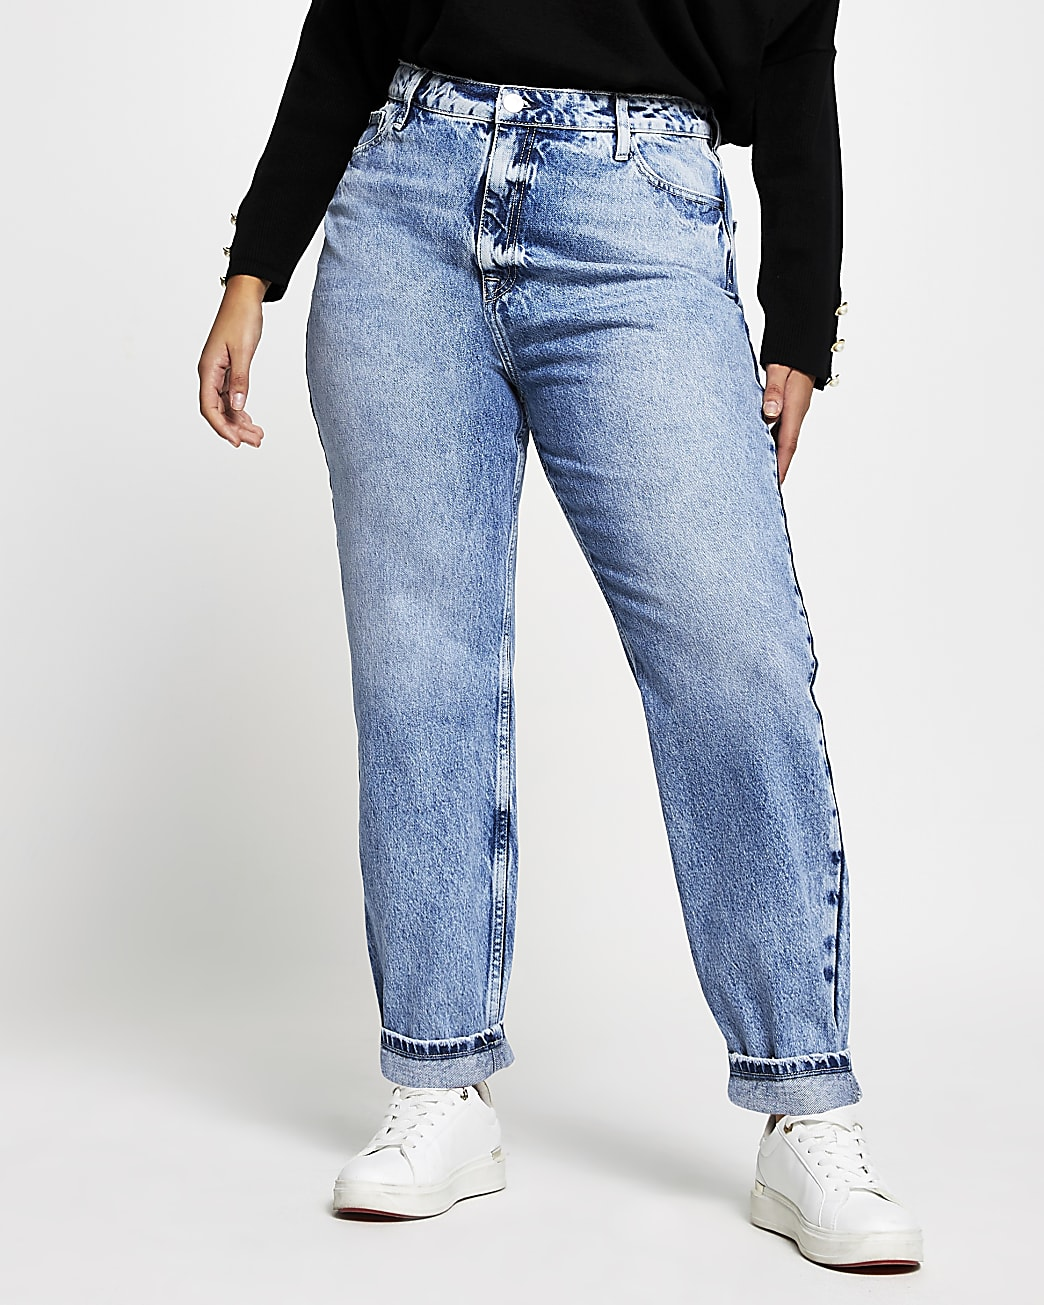 Plus denim Carrie high waisted Mom jeans